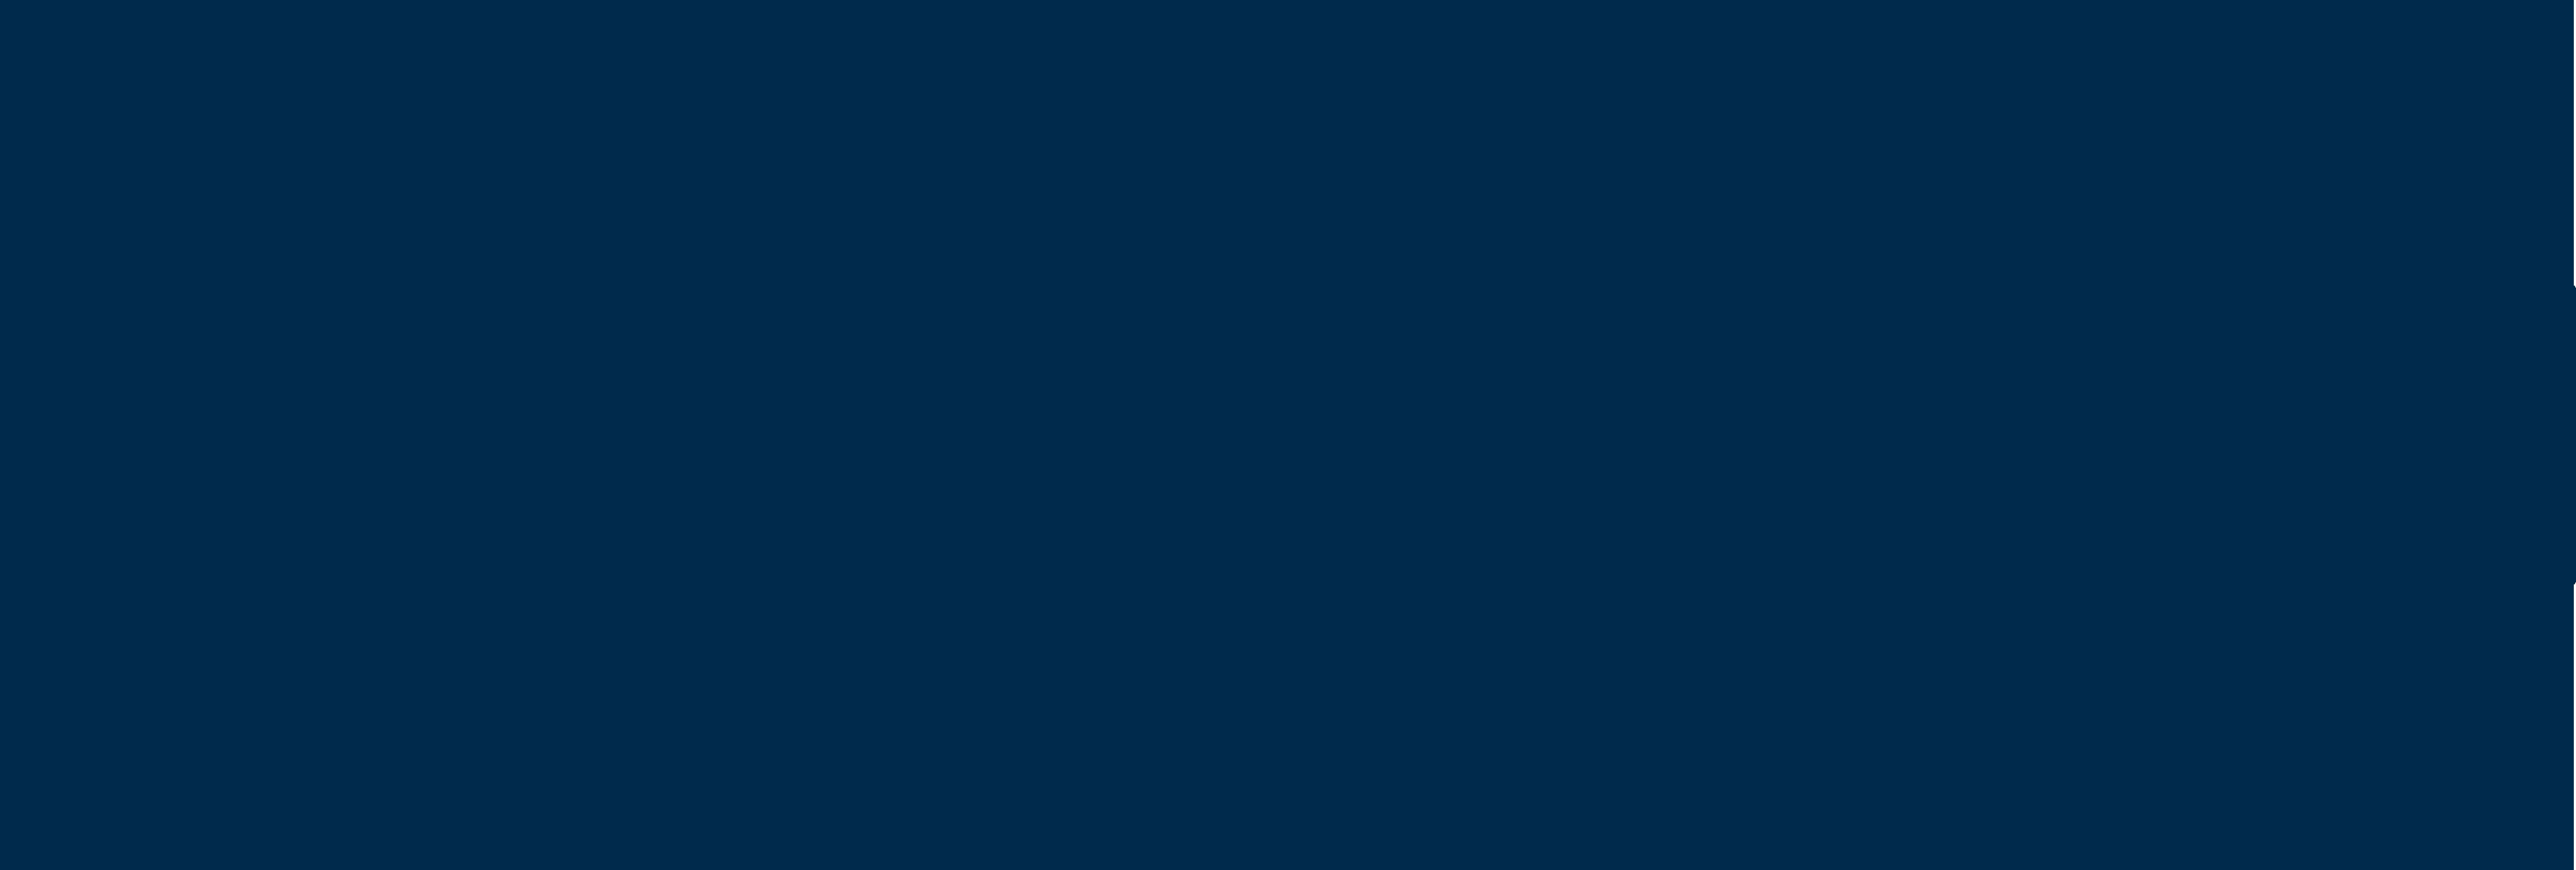 Fintech_Logo_Horizontal_Blue.png